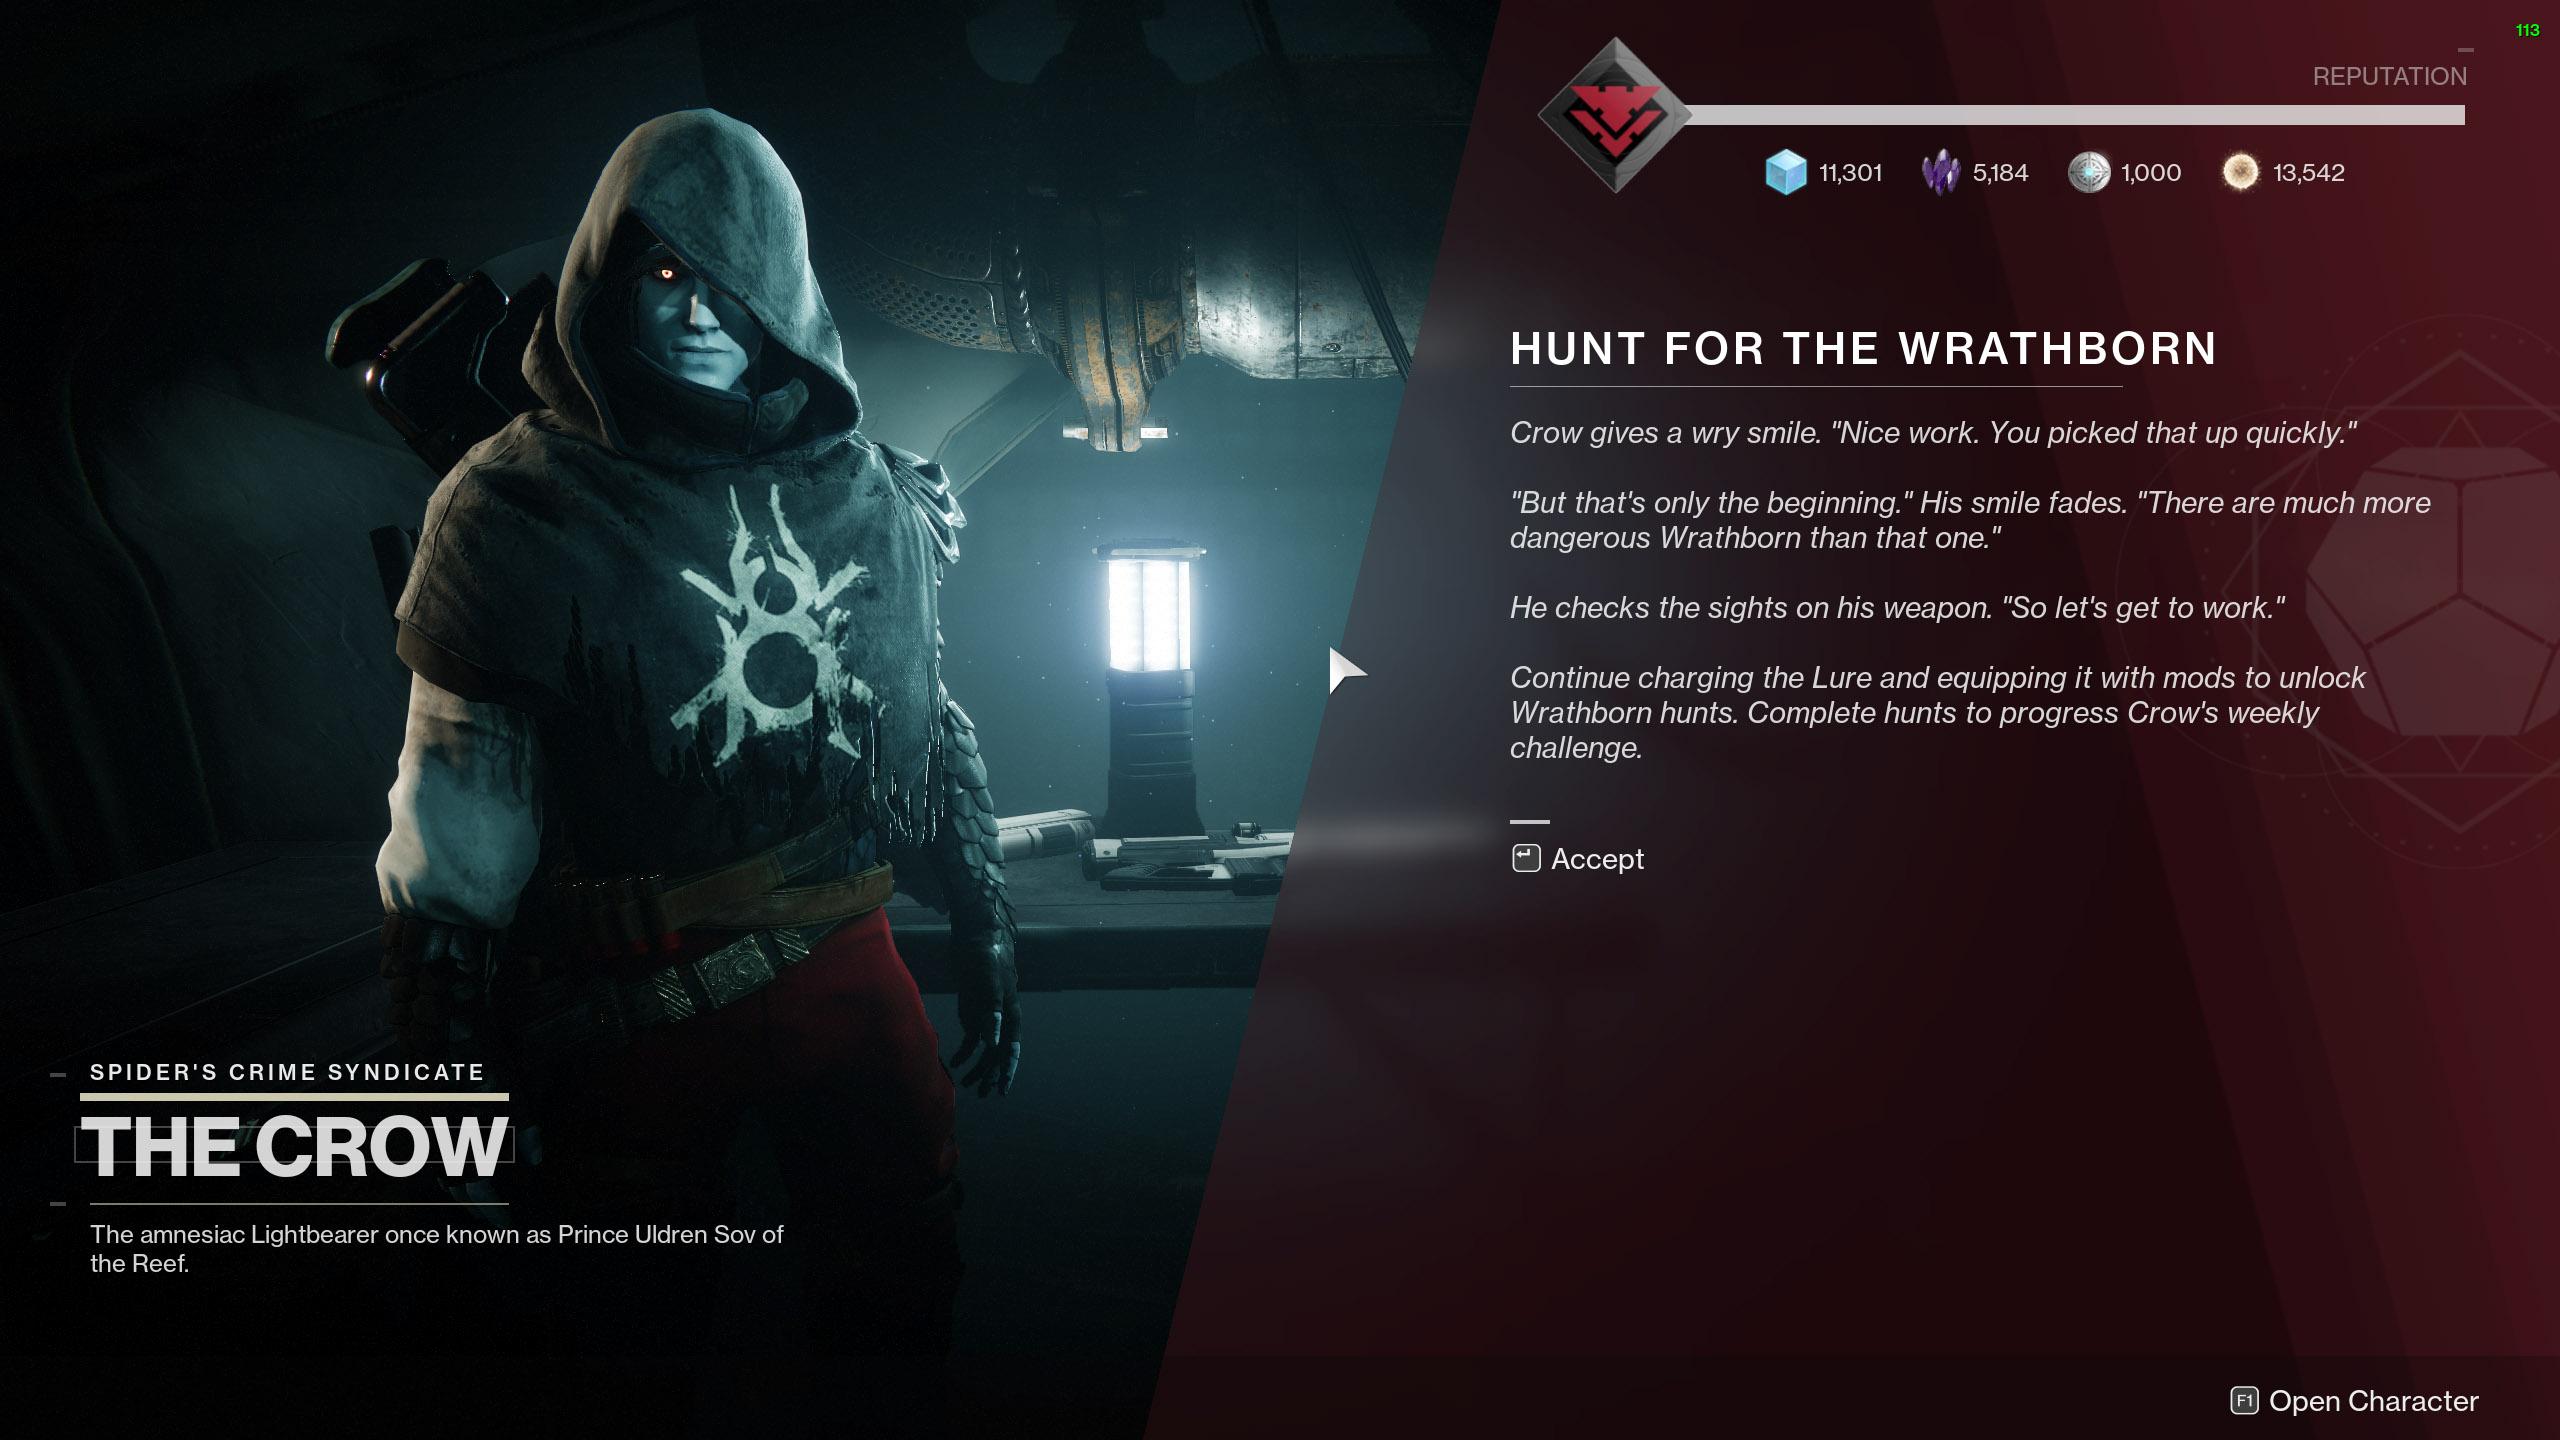 destiny 2 season of the hunt quest